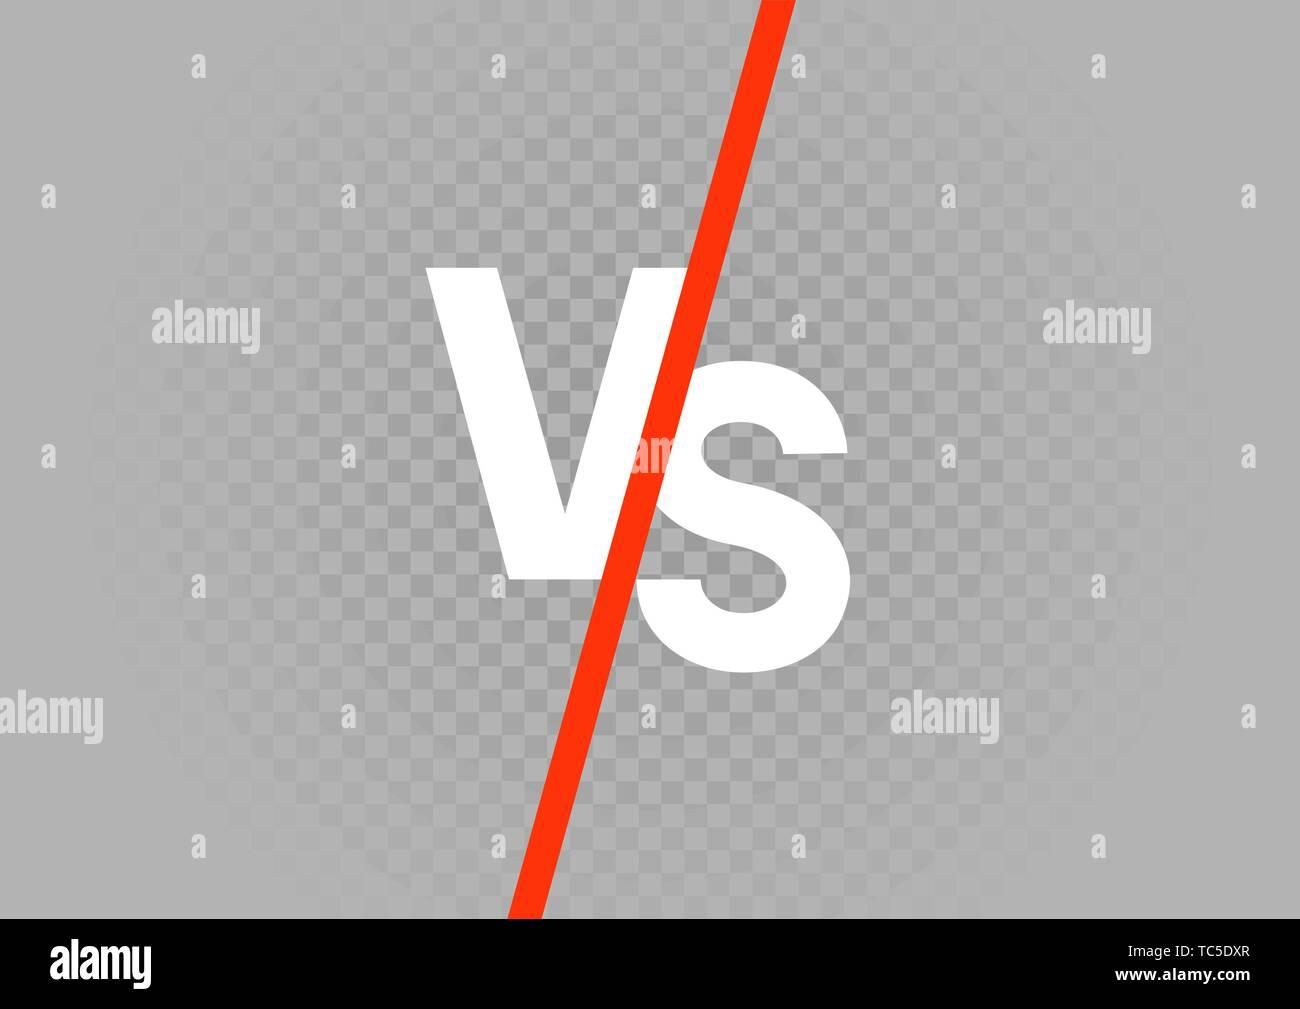 White Versus Vs Letters On Gray Transparent Background Battle